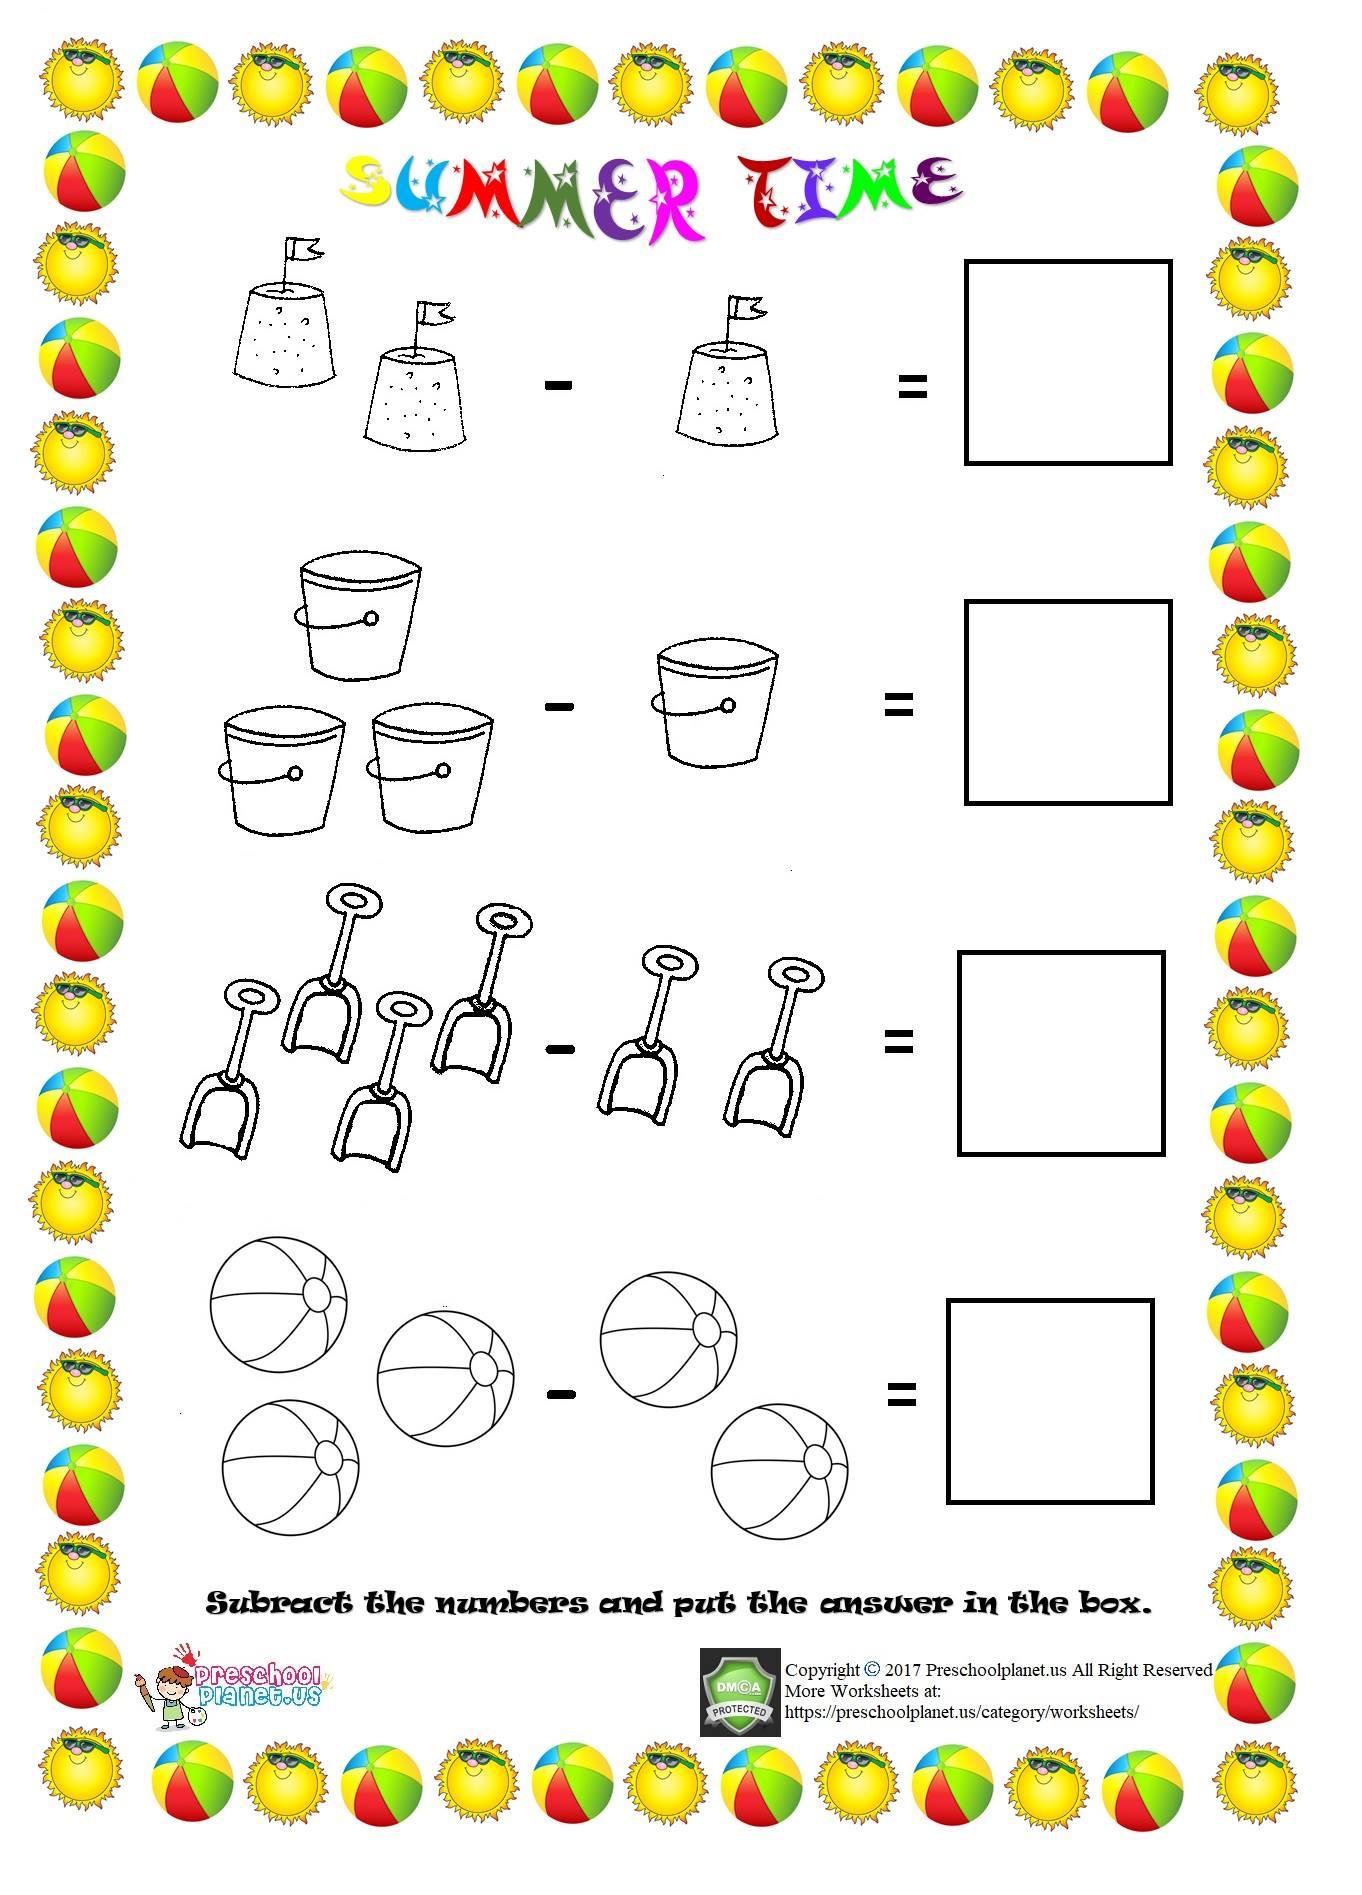 Rectangle Trace Worksheet Preschoolplanet